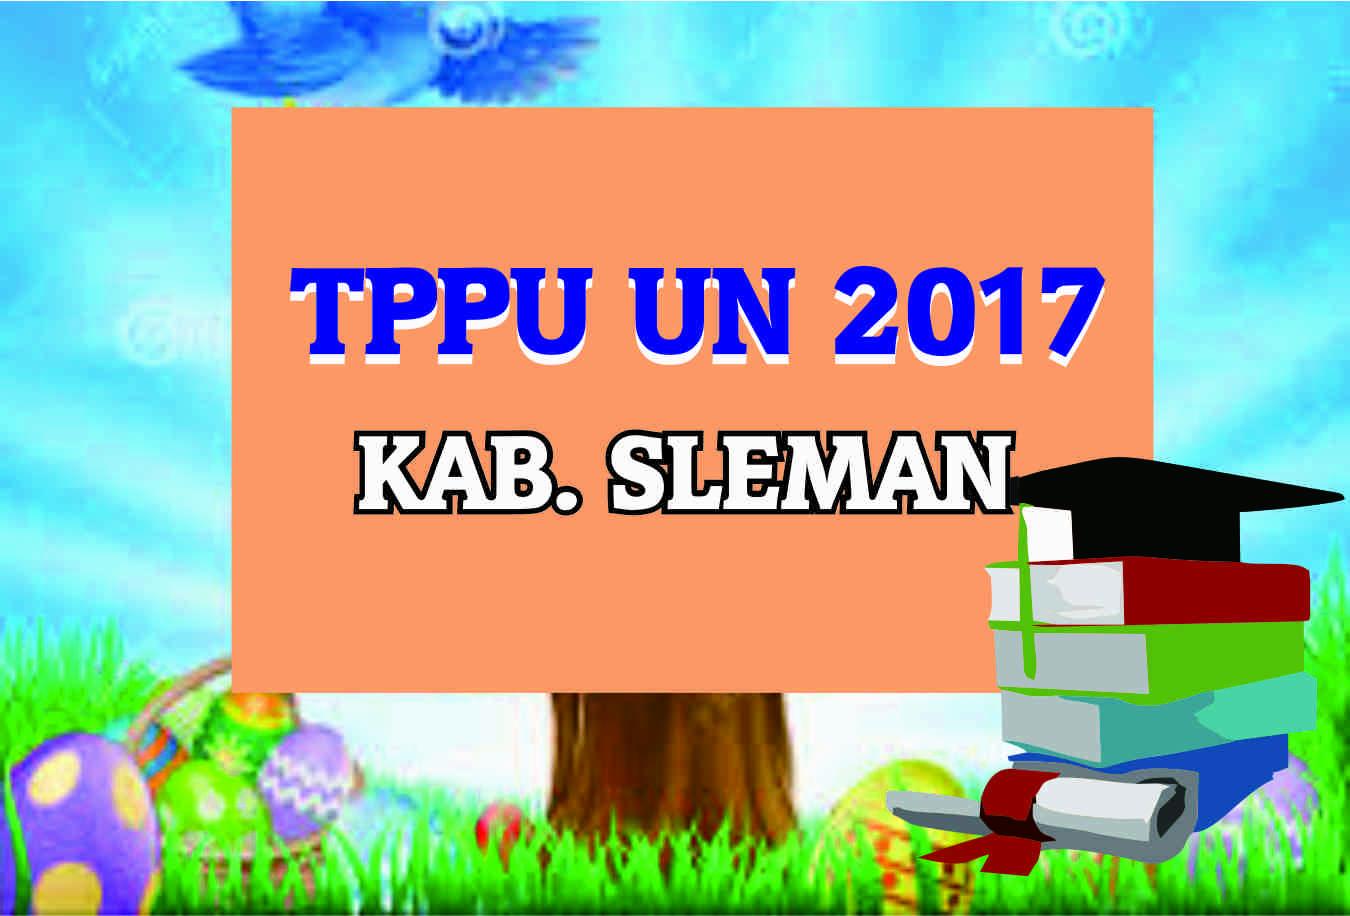 Tppu Tpm Smp Sleman Tahap 1 Tanggal 14 15 November 2016 Giri Widodo